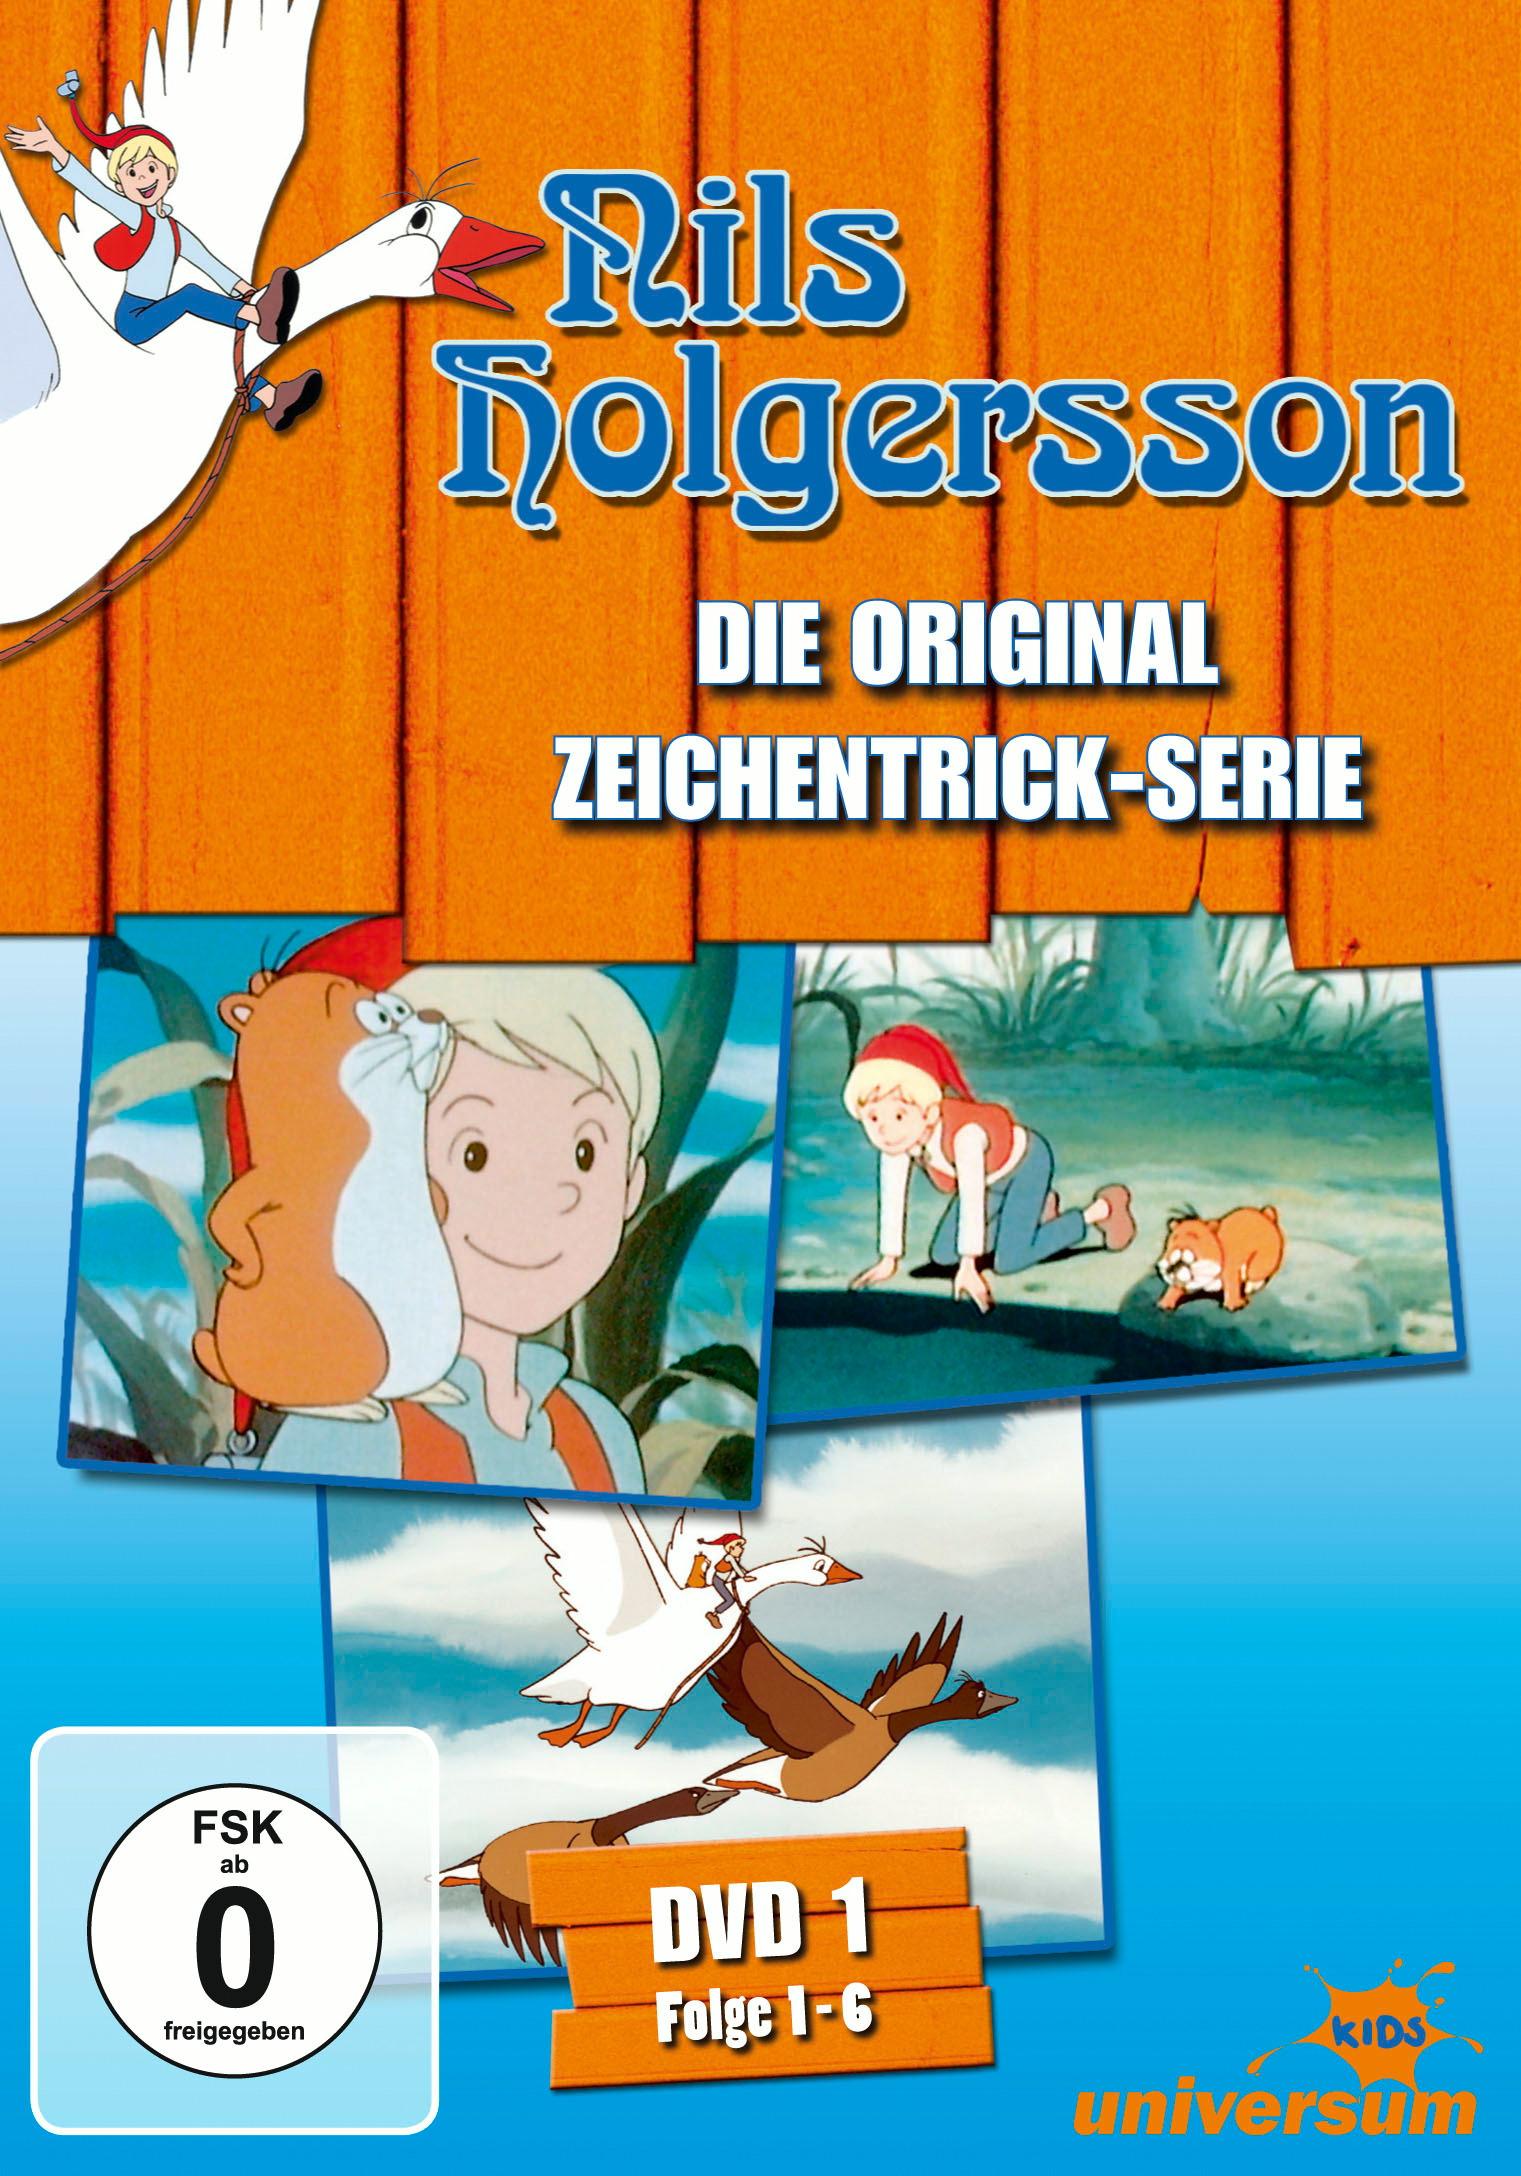 Nils Holgersson - DVD 01 (Folgen 1-6) Poster